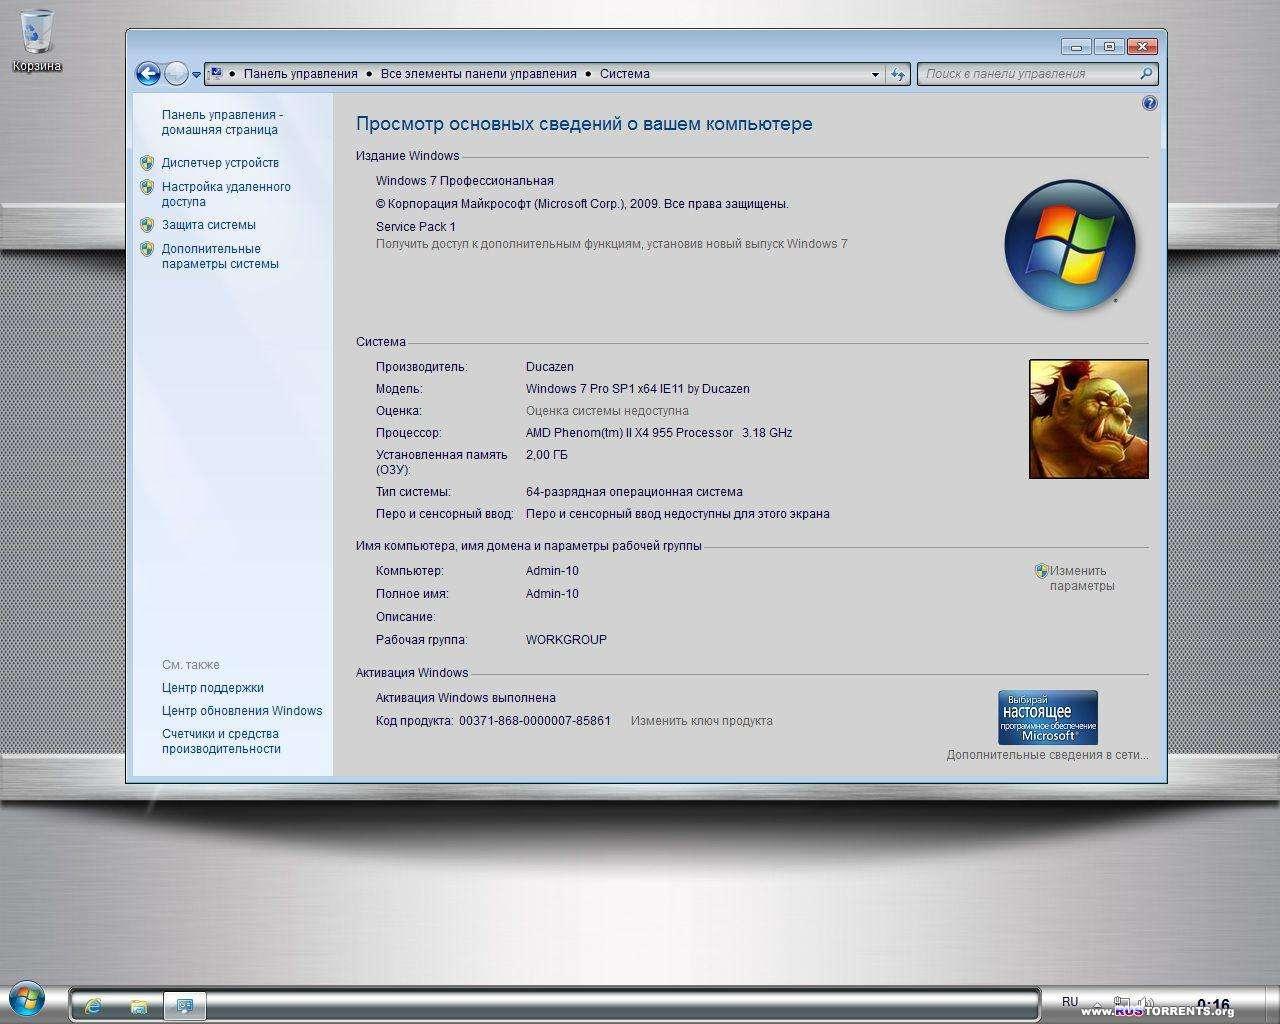 Windows 7 SP1 Professional x64 v.1.13 by Ducazen RUS